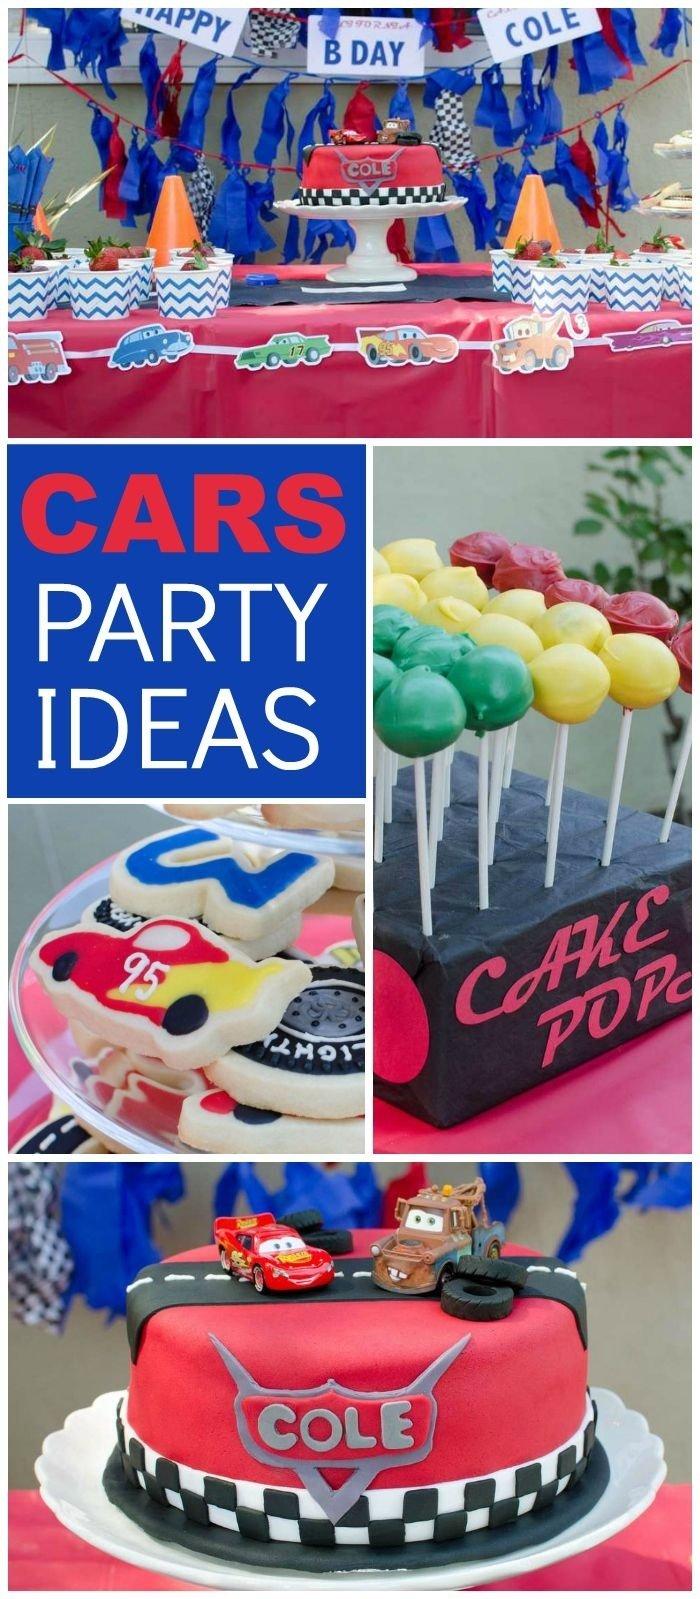 10 Pretty Party Ideas For 3 Year Old Boy Themes Birthday